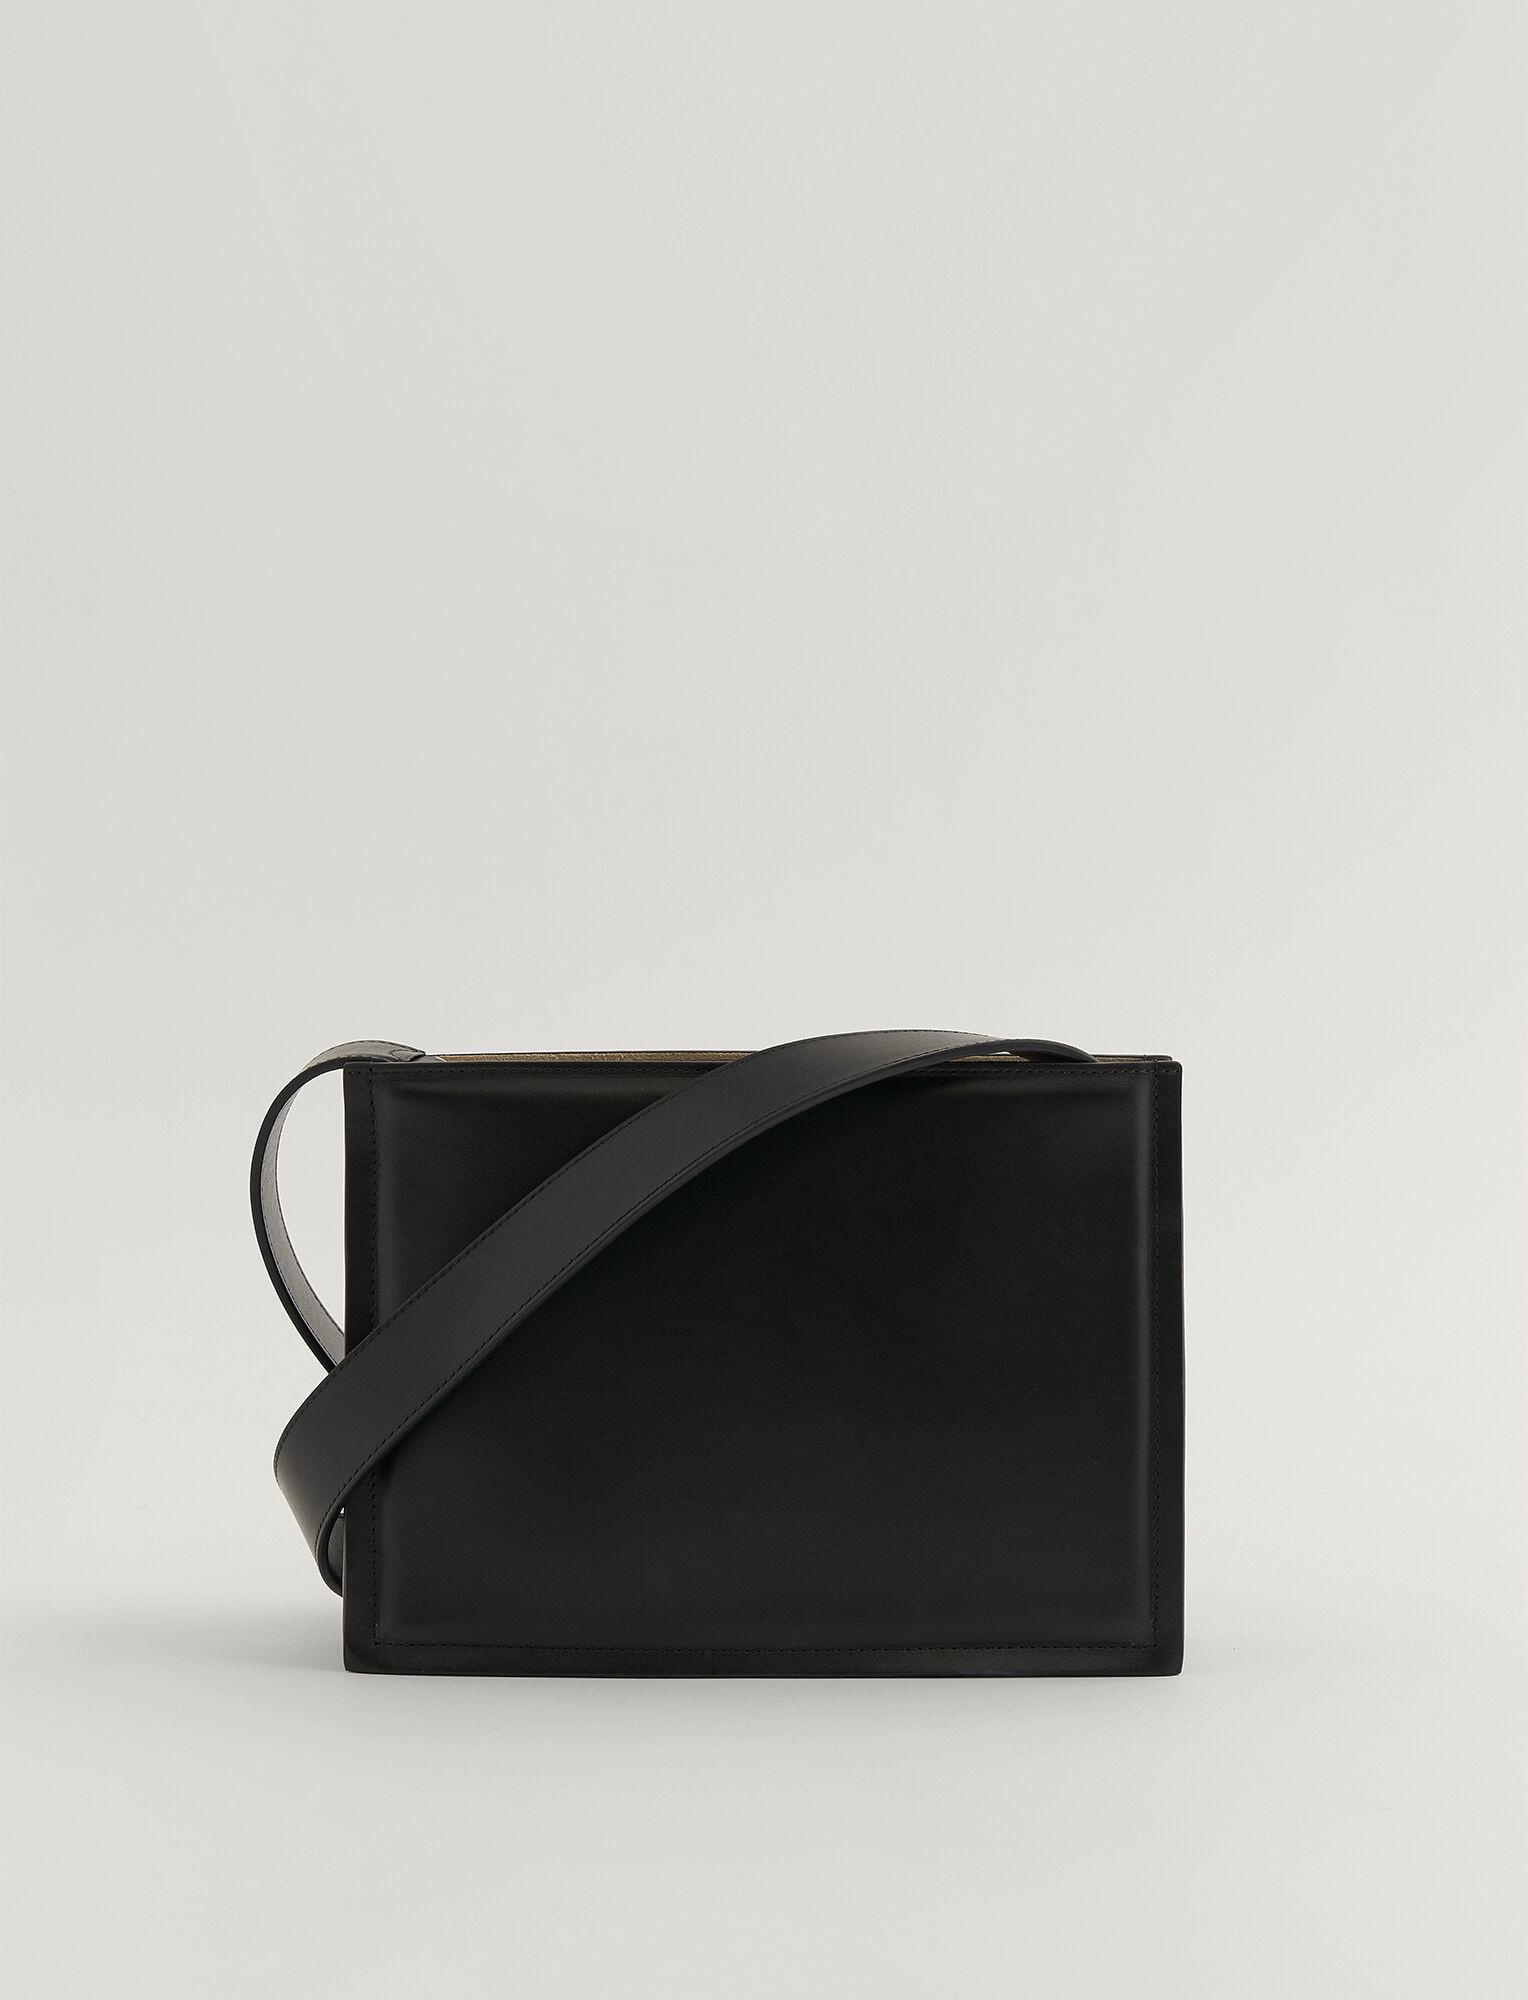 Triple Bag Black